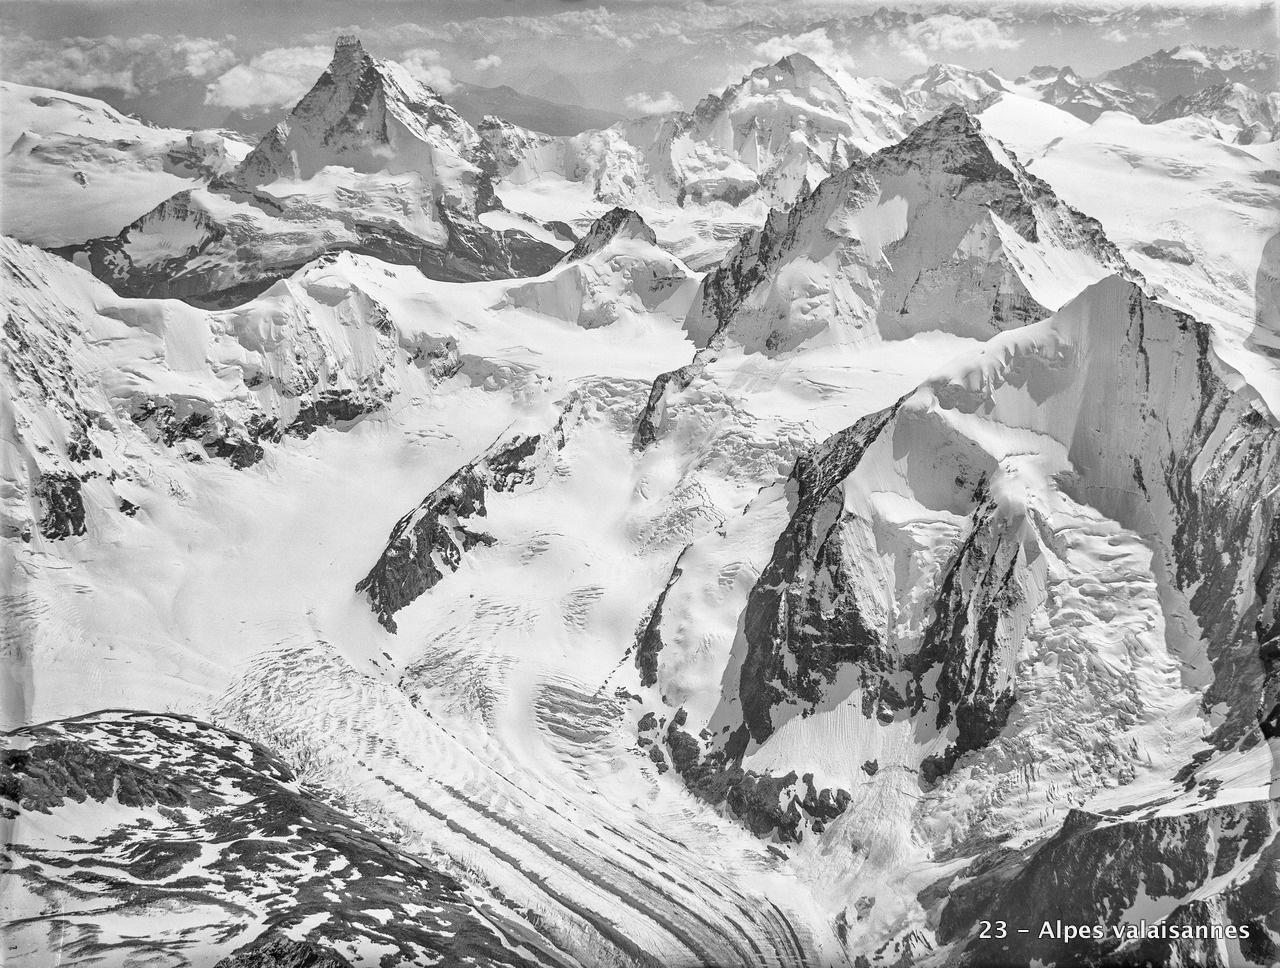 CH-NB_-_Walliser_Alpen_-_Eduard_Spelterini_-_EAD-WEHR-32055-B.tif